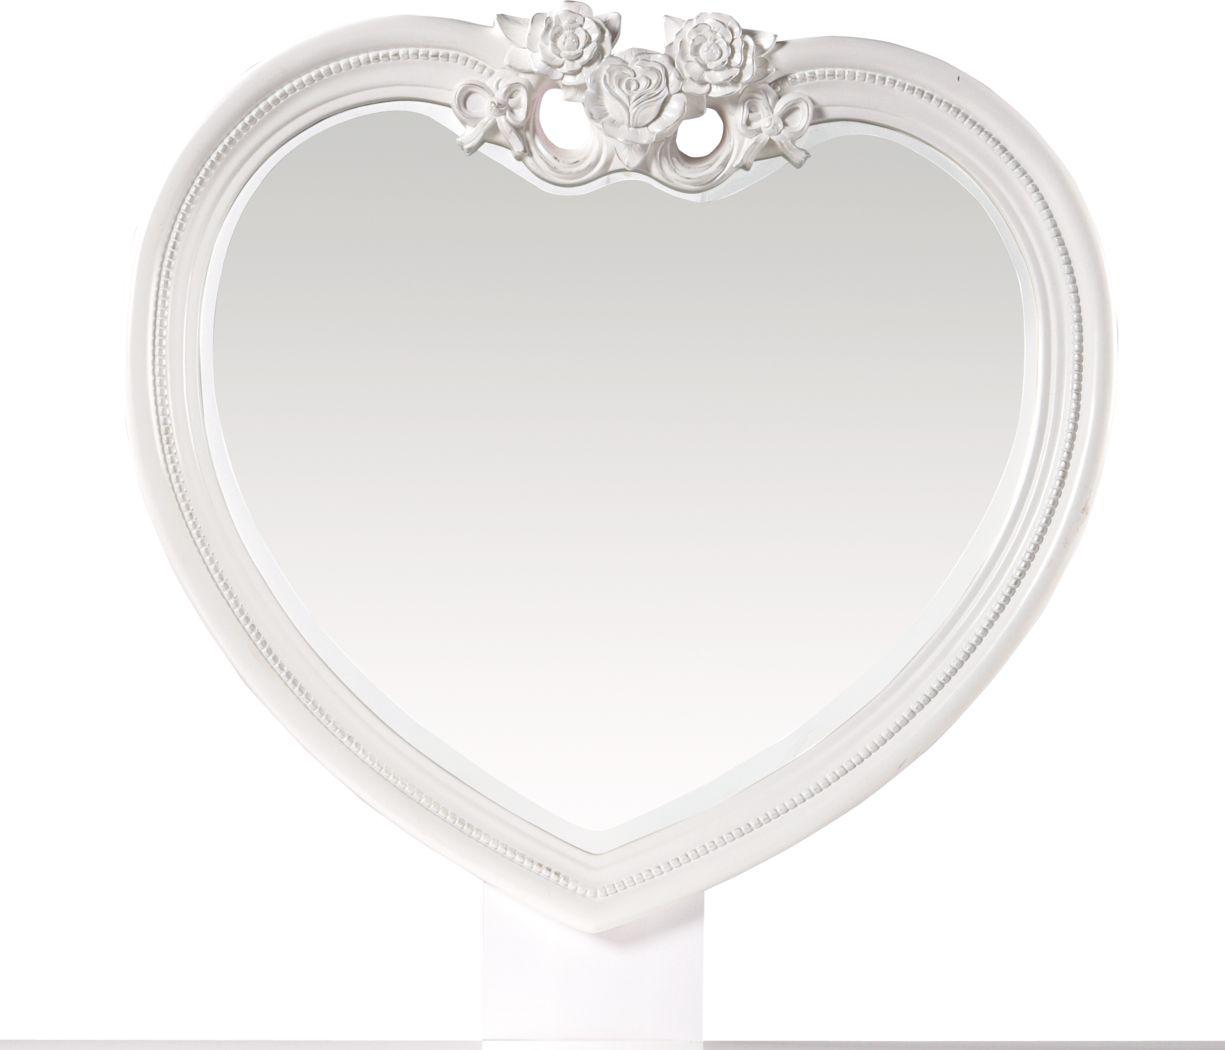 Disney Princess Fairytale White Heart Mirror